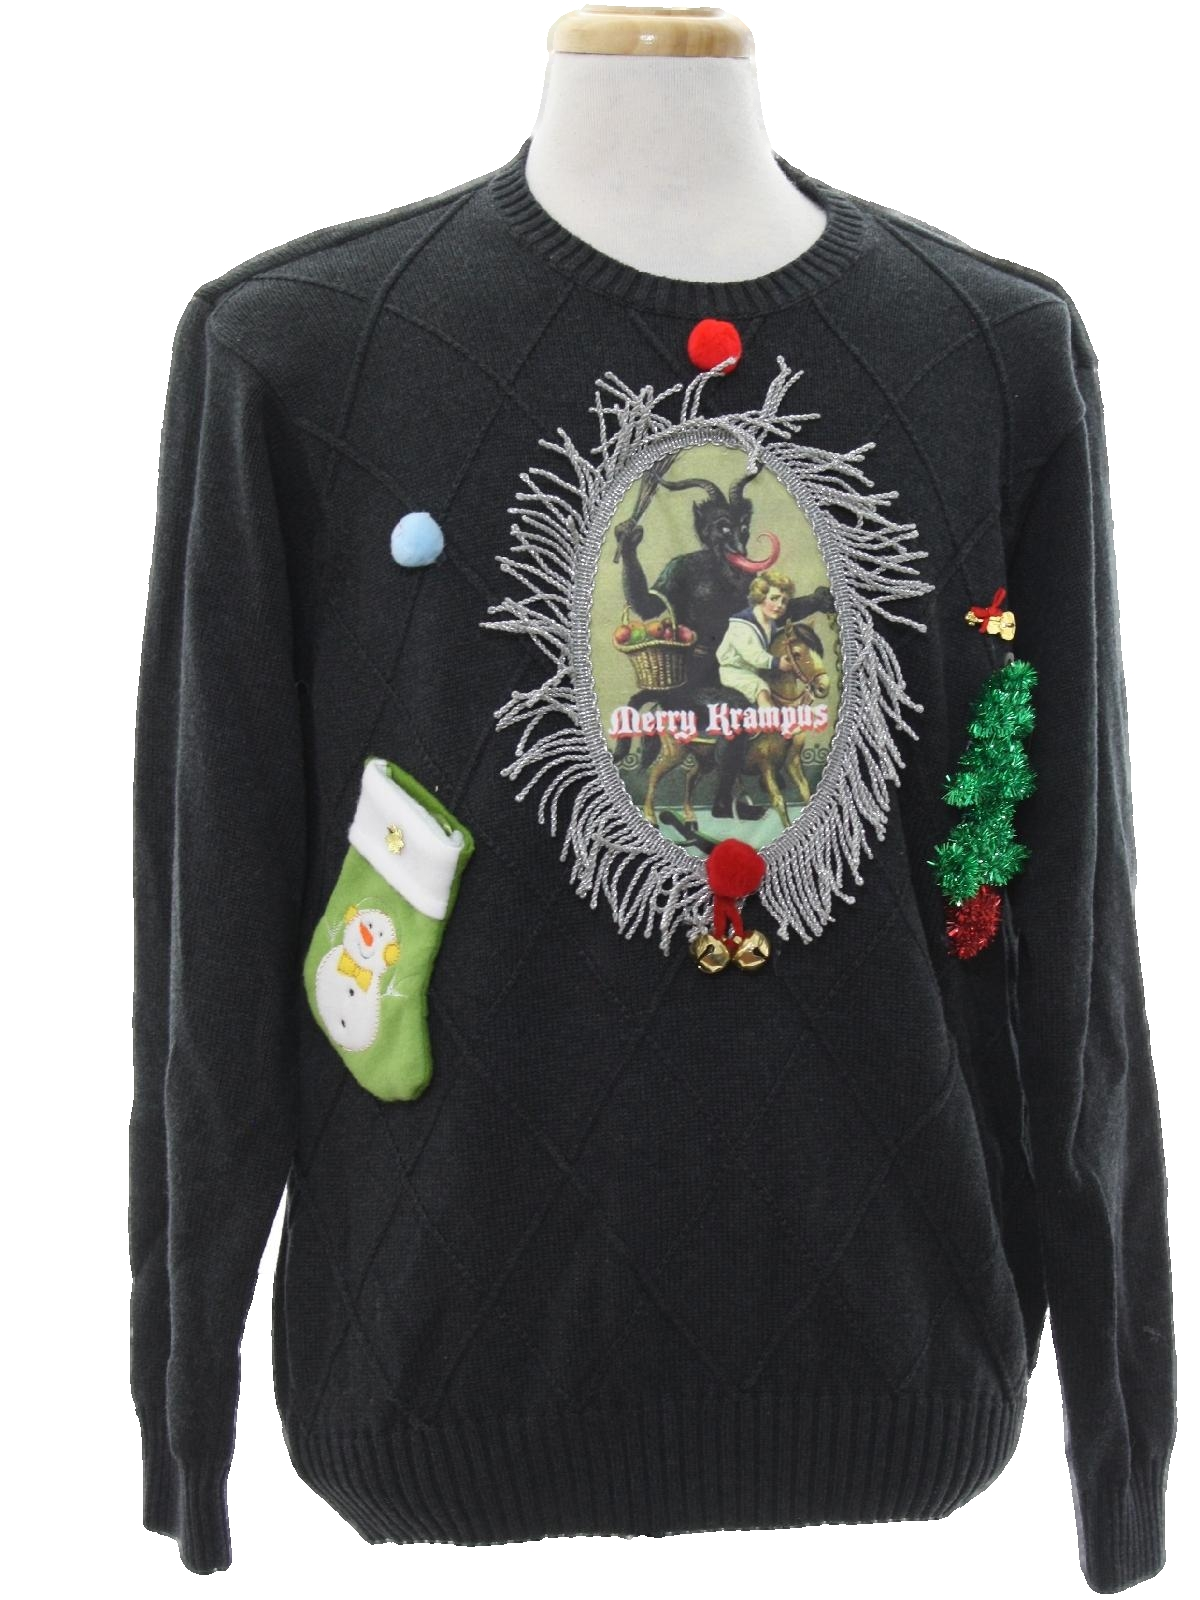 cffb927fc7 Mens Krampus Ugly Christmas Sweater  -IZOD- Mens grey cotton ...